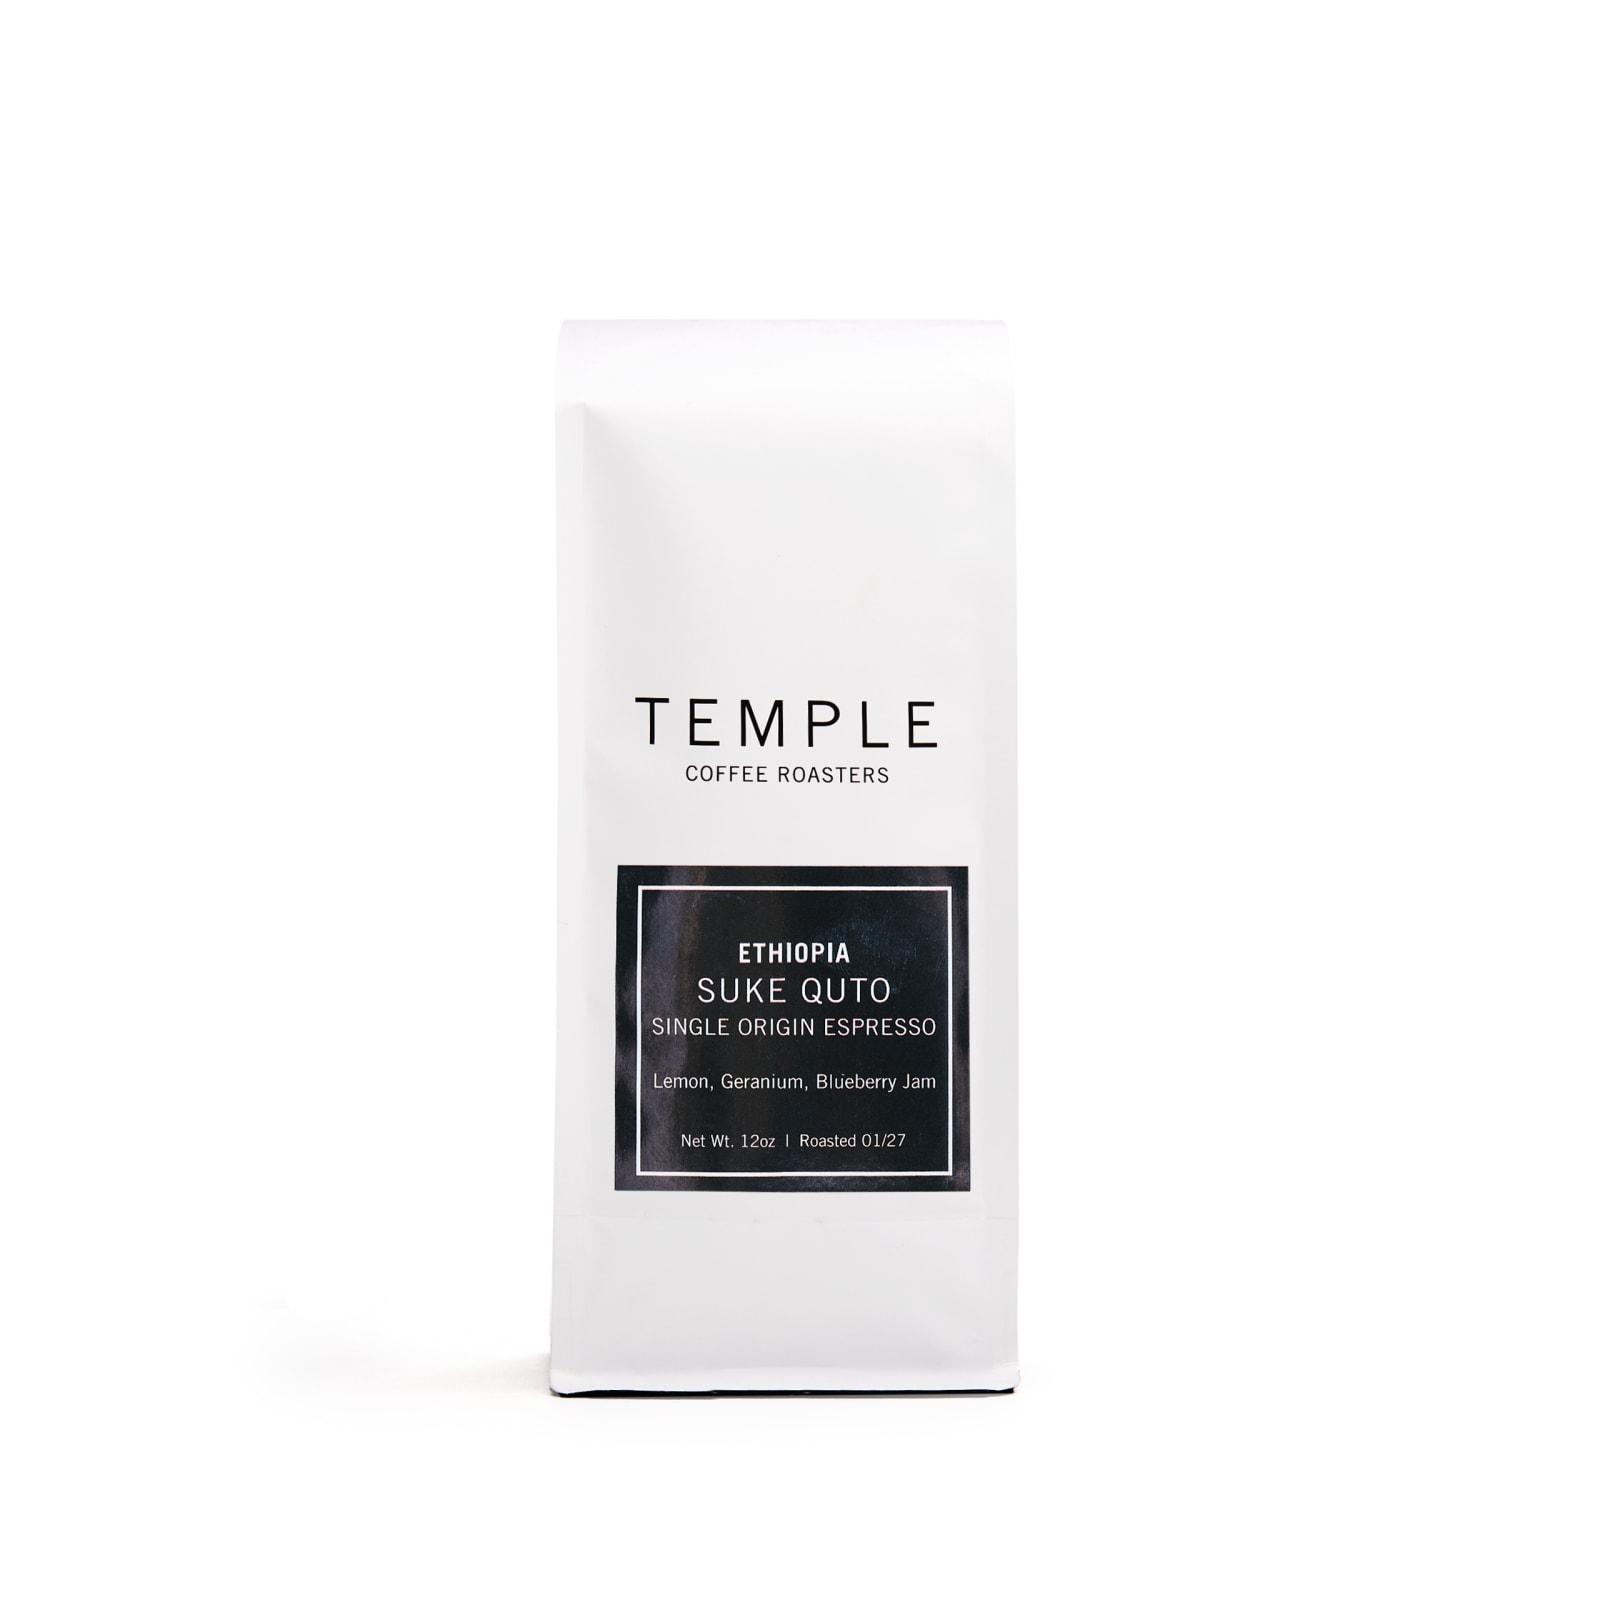 Ethiopia Suke Quto Single Origin Espresso